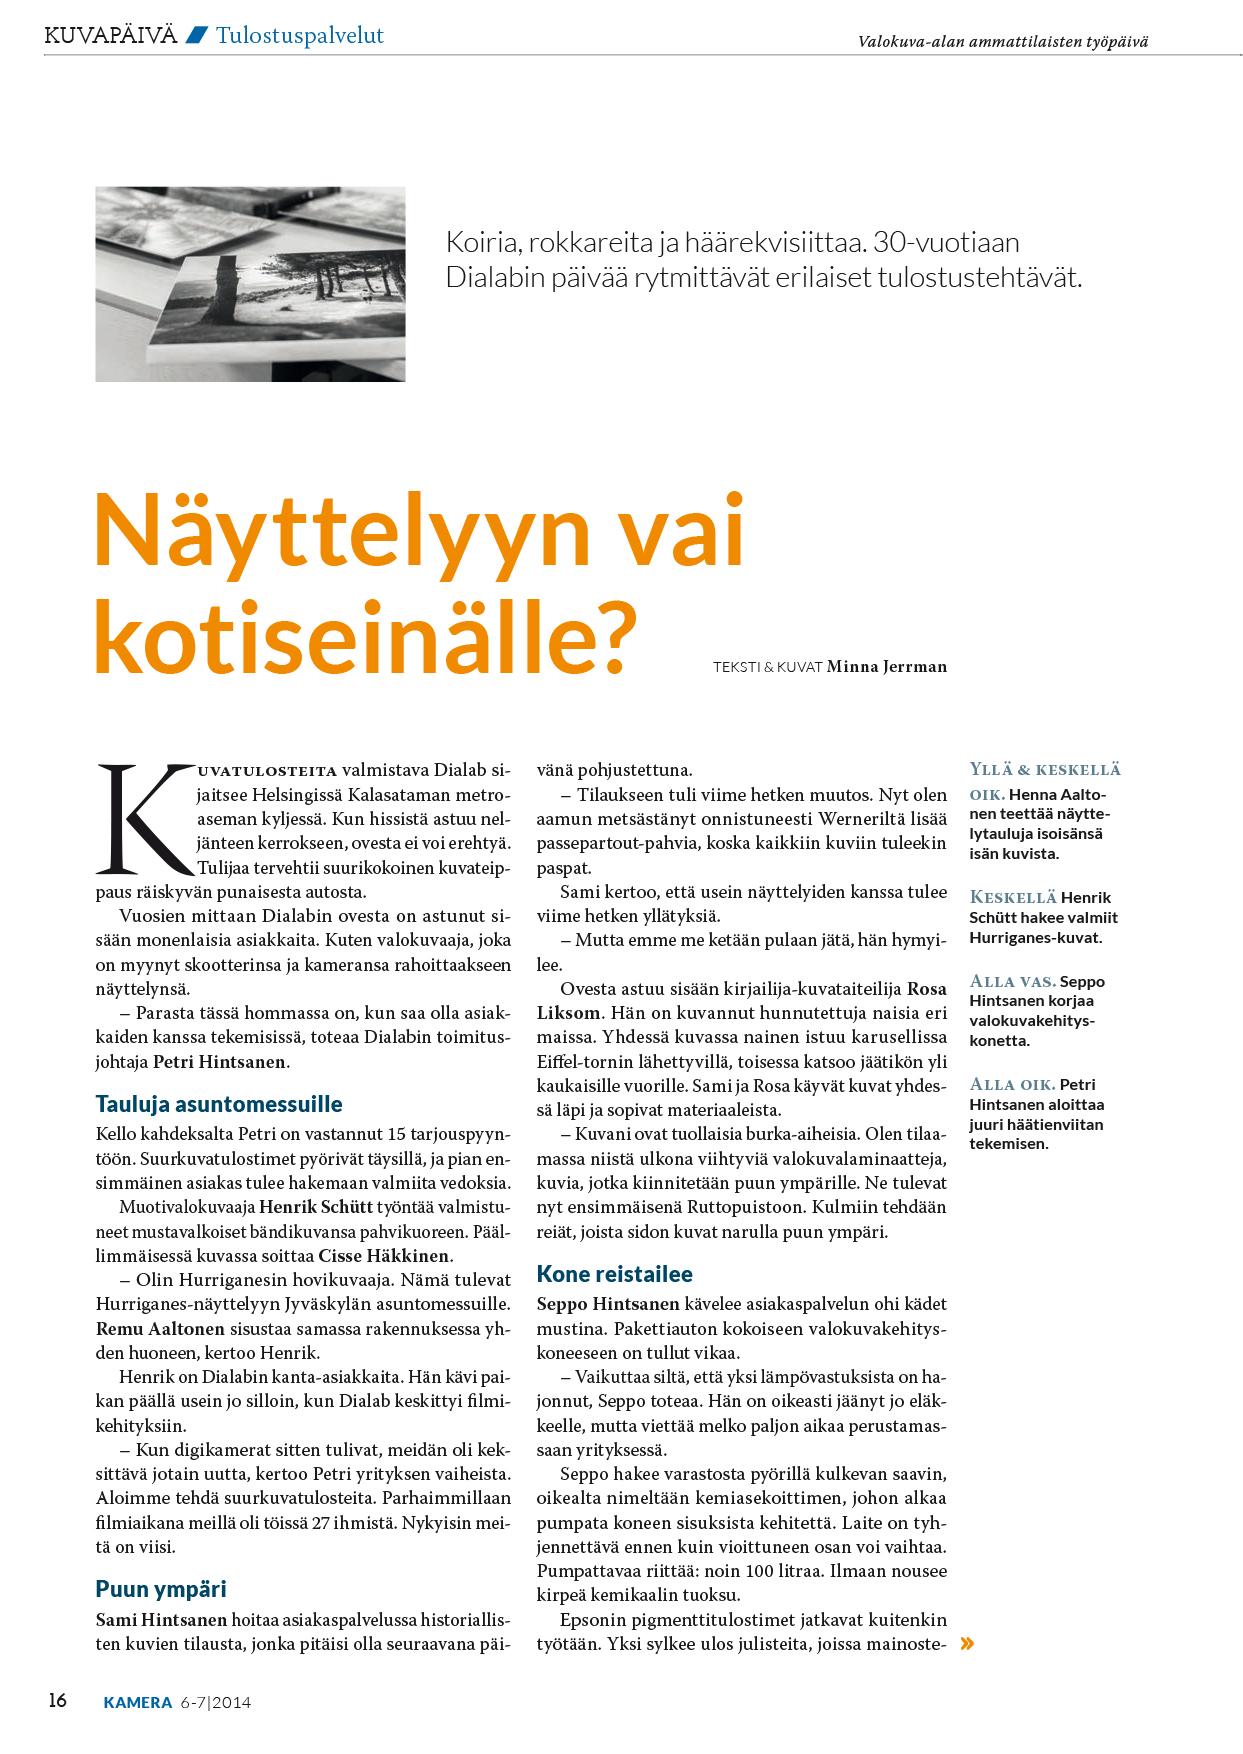 Kuvapäivä_Kamera-lehti_6-7-2014.pdf-1.jpg